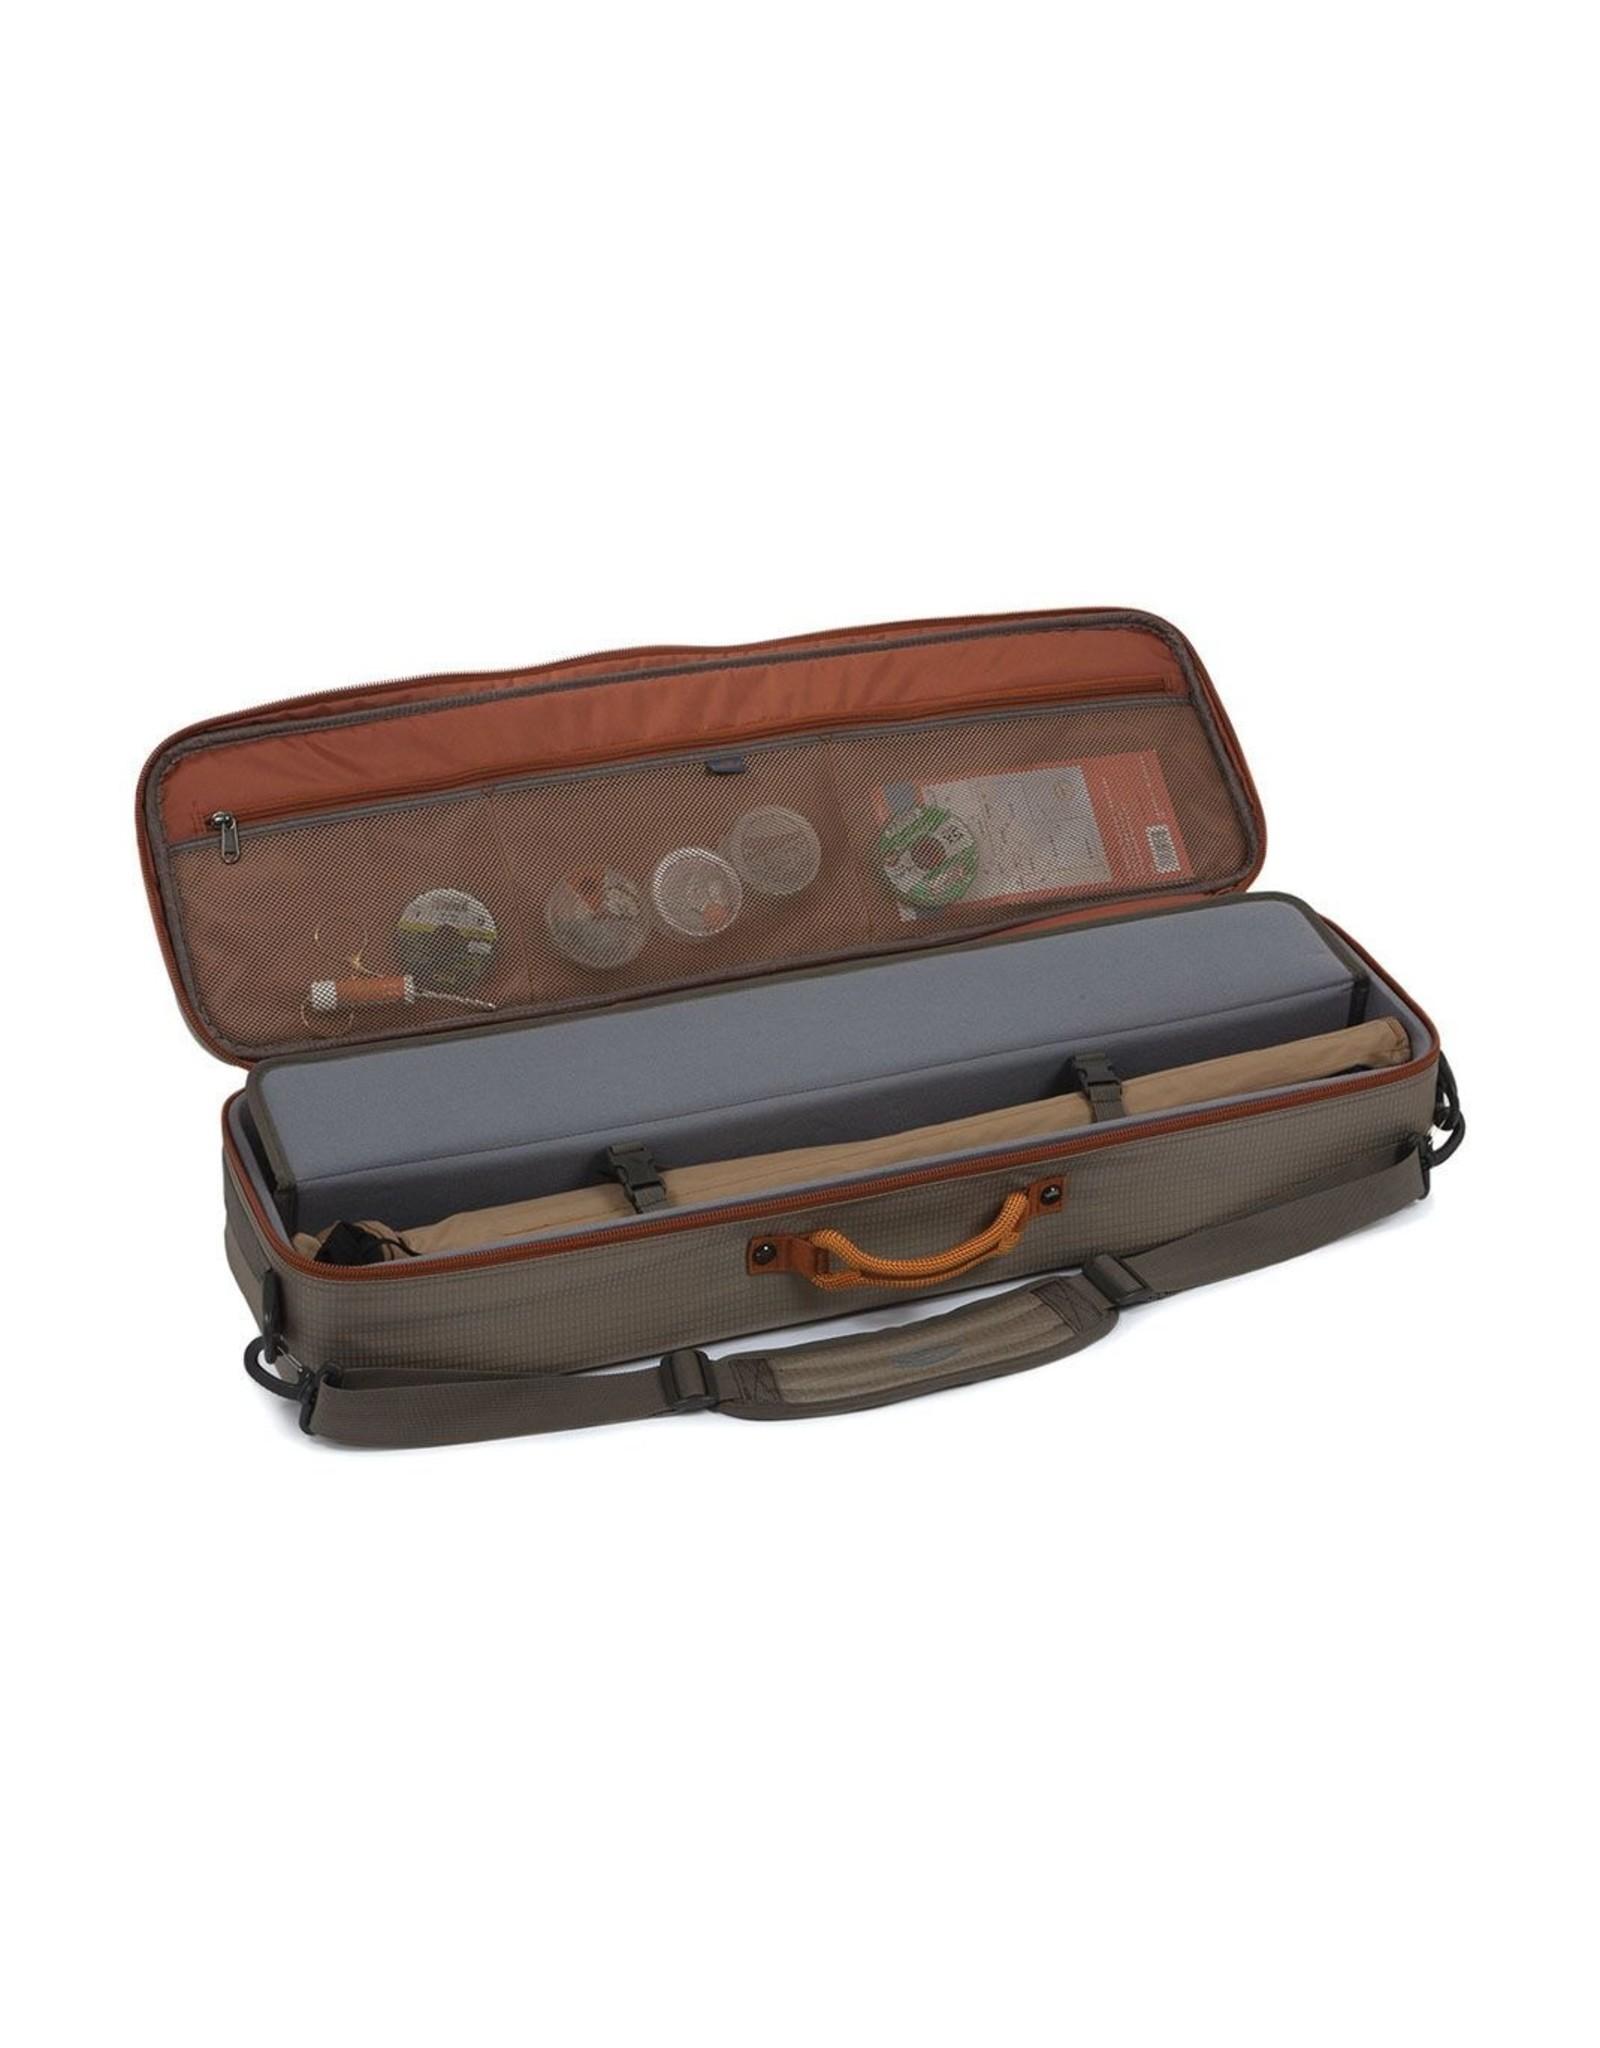 Fishpond Fishpond - Dakota Carry On Rod & Reel Case